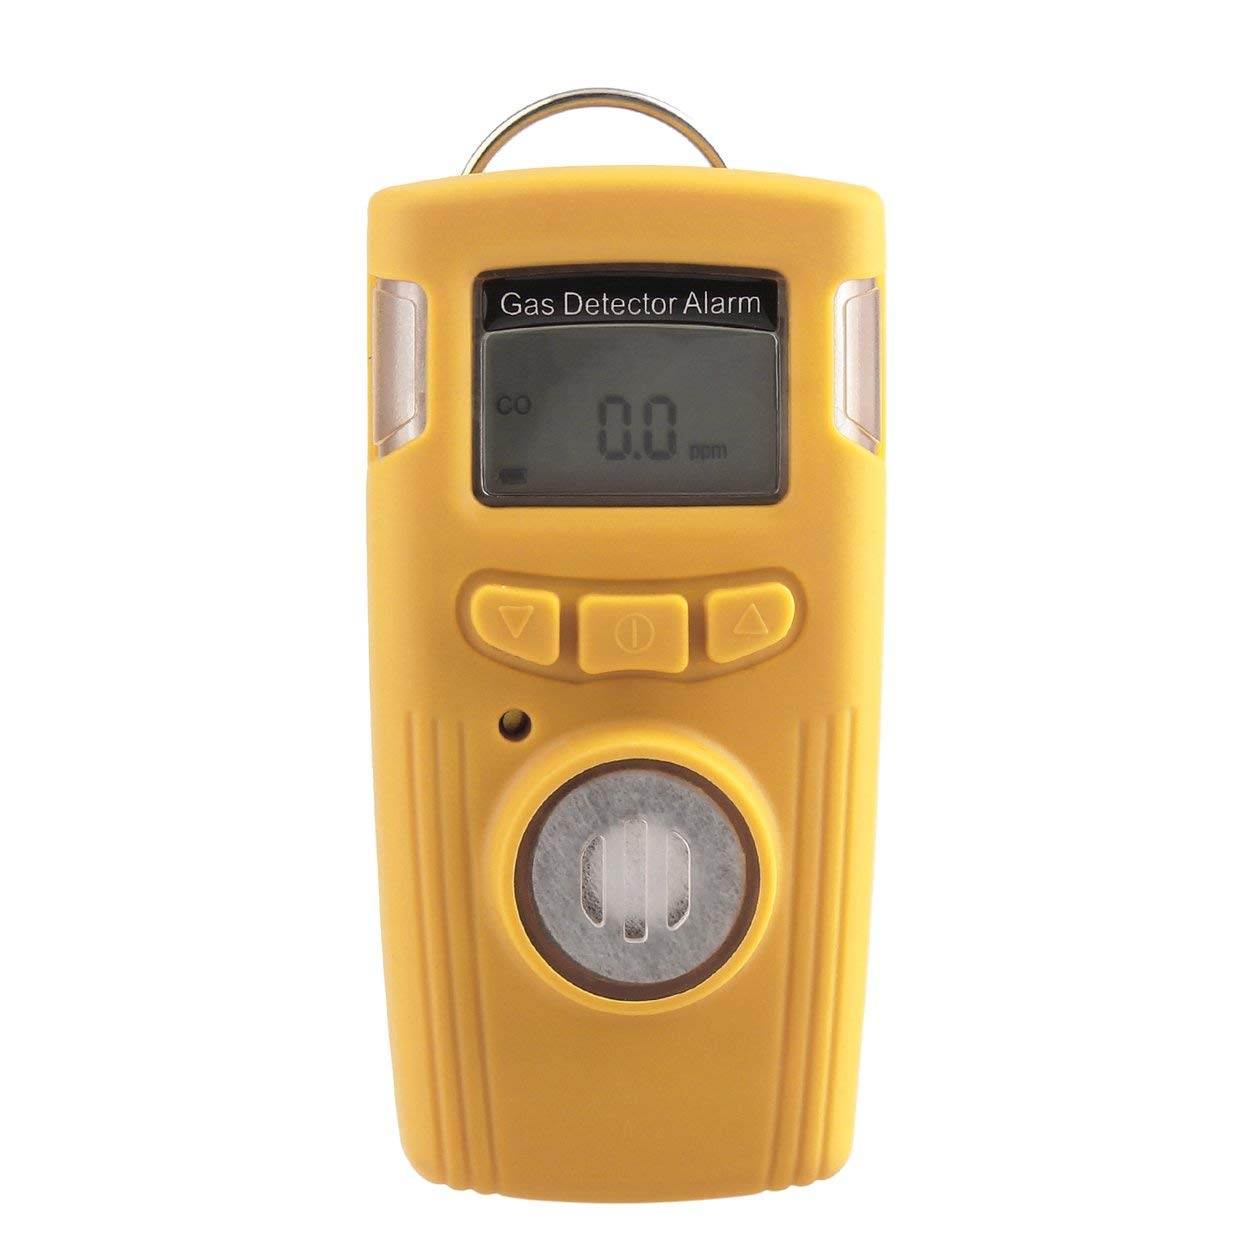 Losenlli Mini portátil HT-530 Detector de monóxido de Carbono Detector de Gas Alarma LCD Probador de Gas CO eléctrico 1000 ppm Precisión +/- 5 ppm: ...